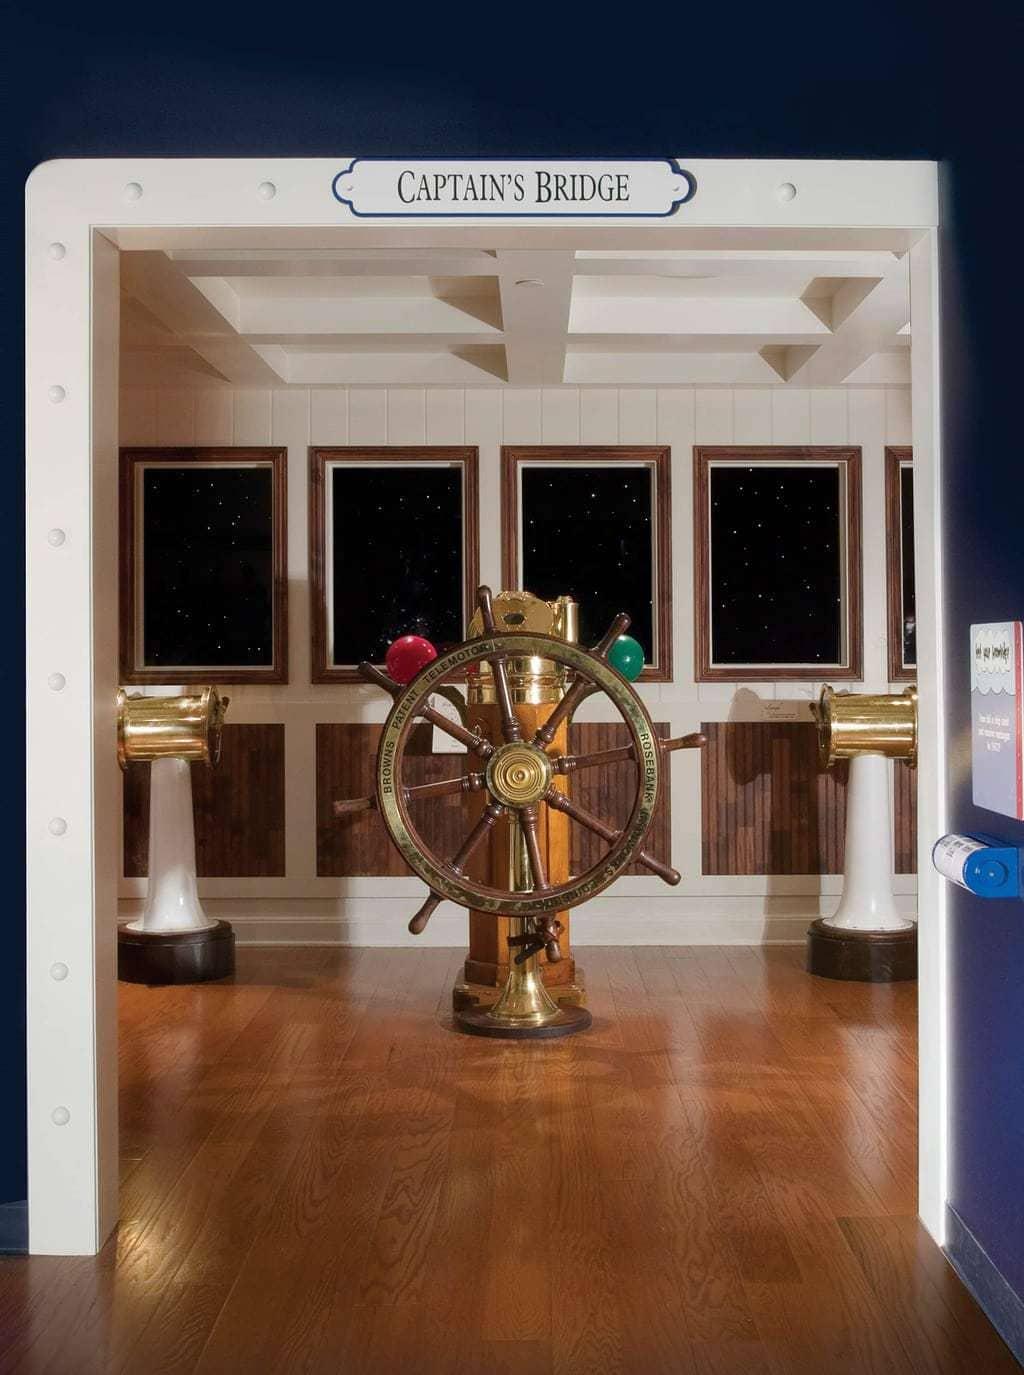 titanic museum, Branson titanic museum, titanic museum in Branson